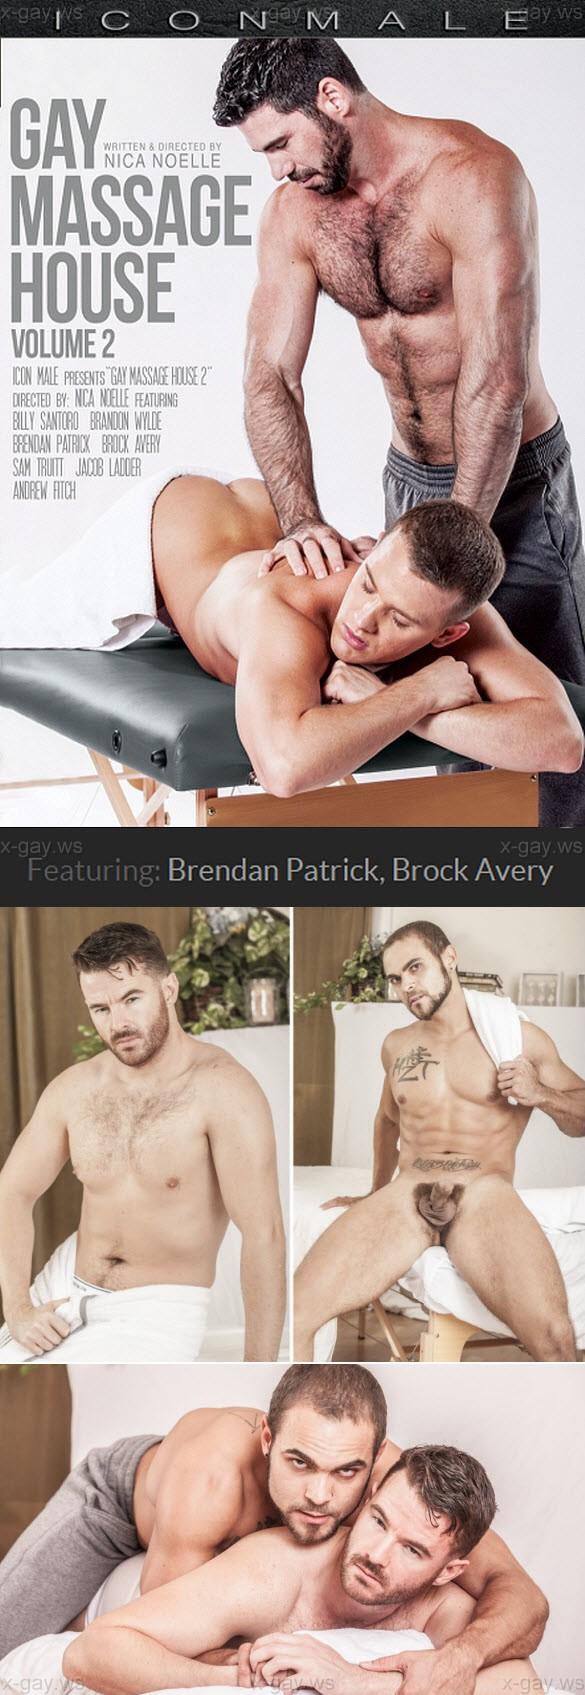 IconMale – Brendan Patrick & Brock Avery